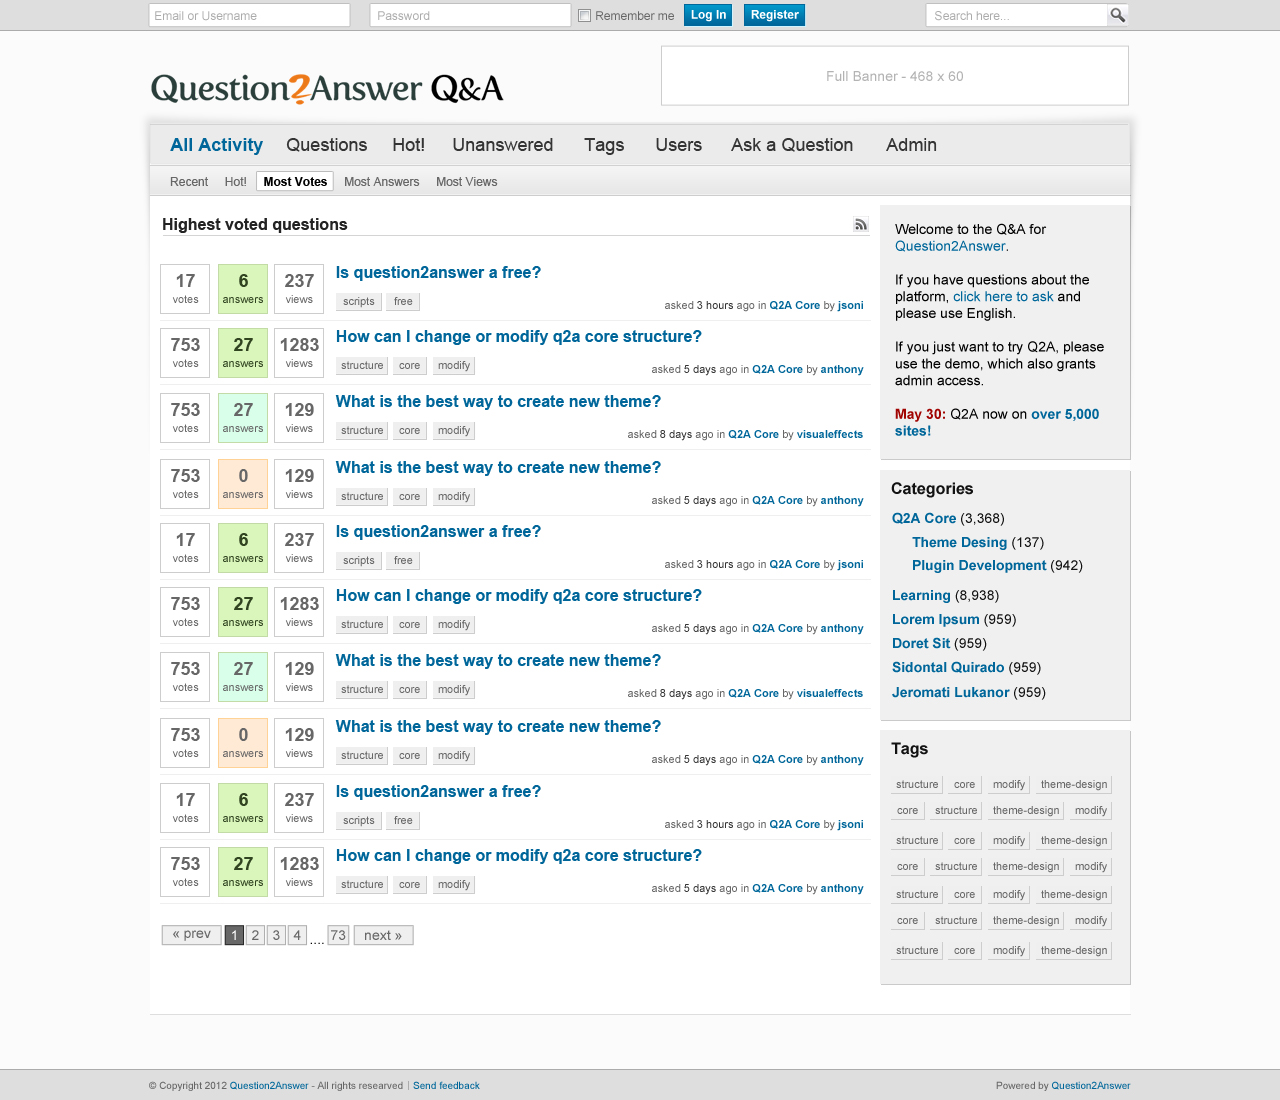 اسکریپت پرسش و پاسخ Question2Answer فارسی نسخه ۱٫۸٫۰